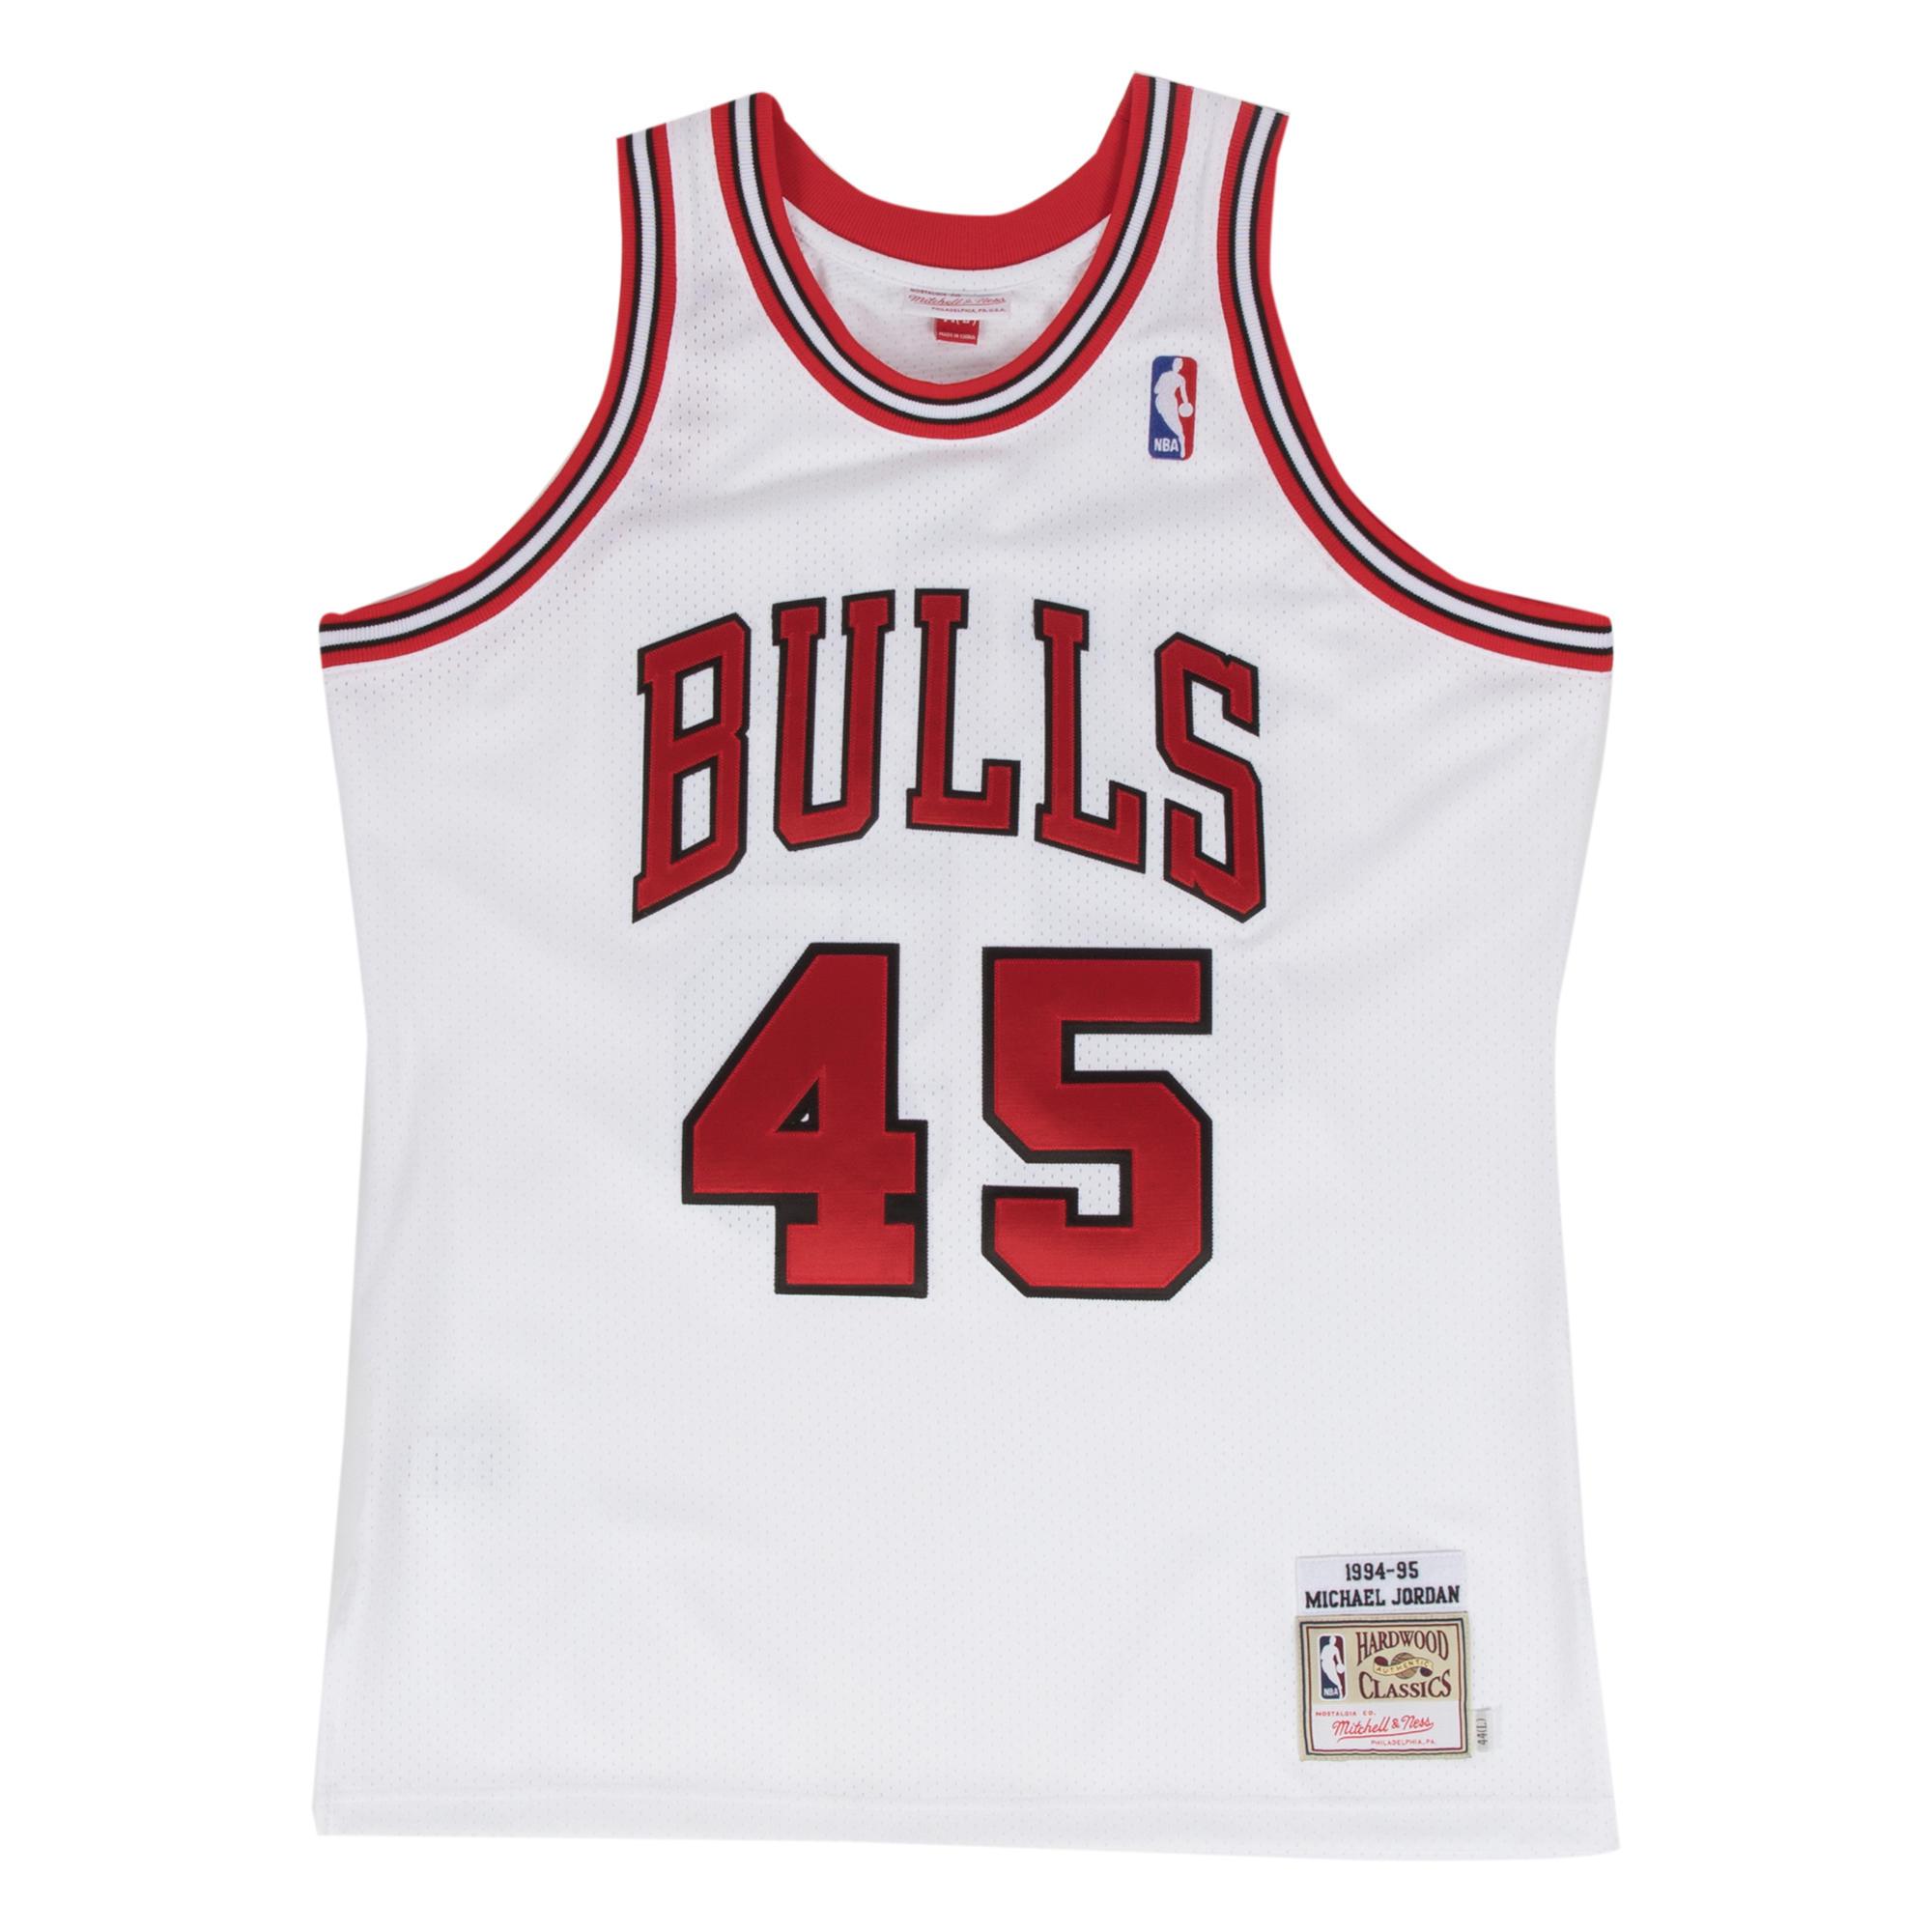 cheaper 4ca0a 5f9fb Mitchell & Ness   Premium Gold Jersey Chicago Bulls 1995-96 ...